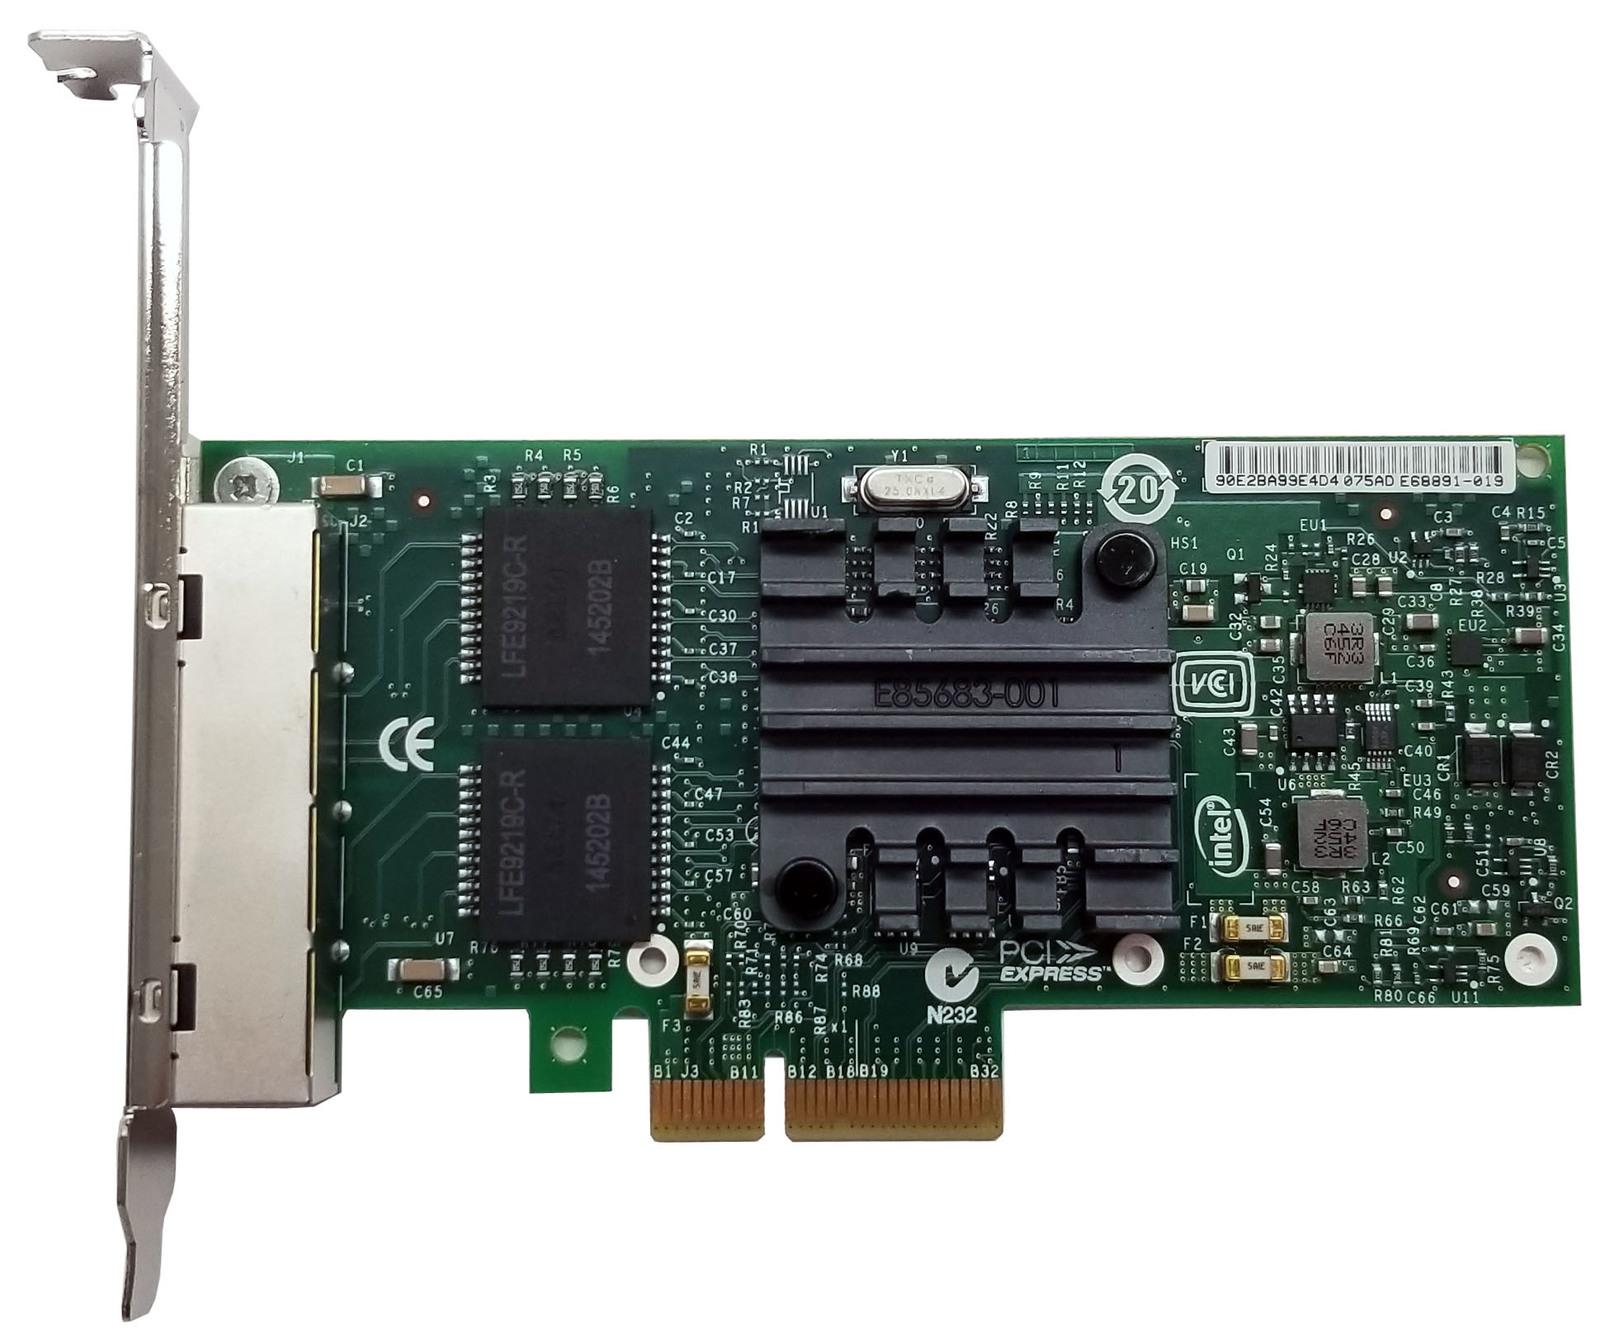 Intel Ethernet Server Adapter PCIe Quad Port I340-T4 Bin:12